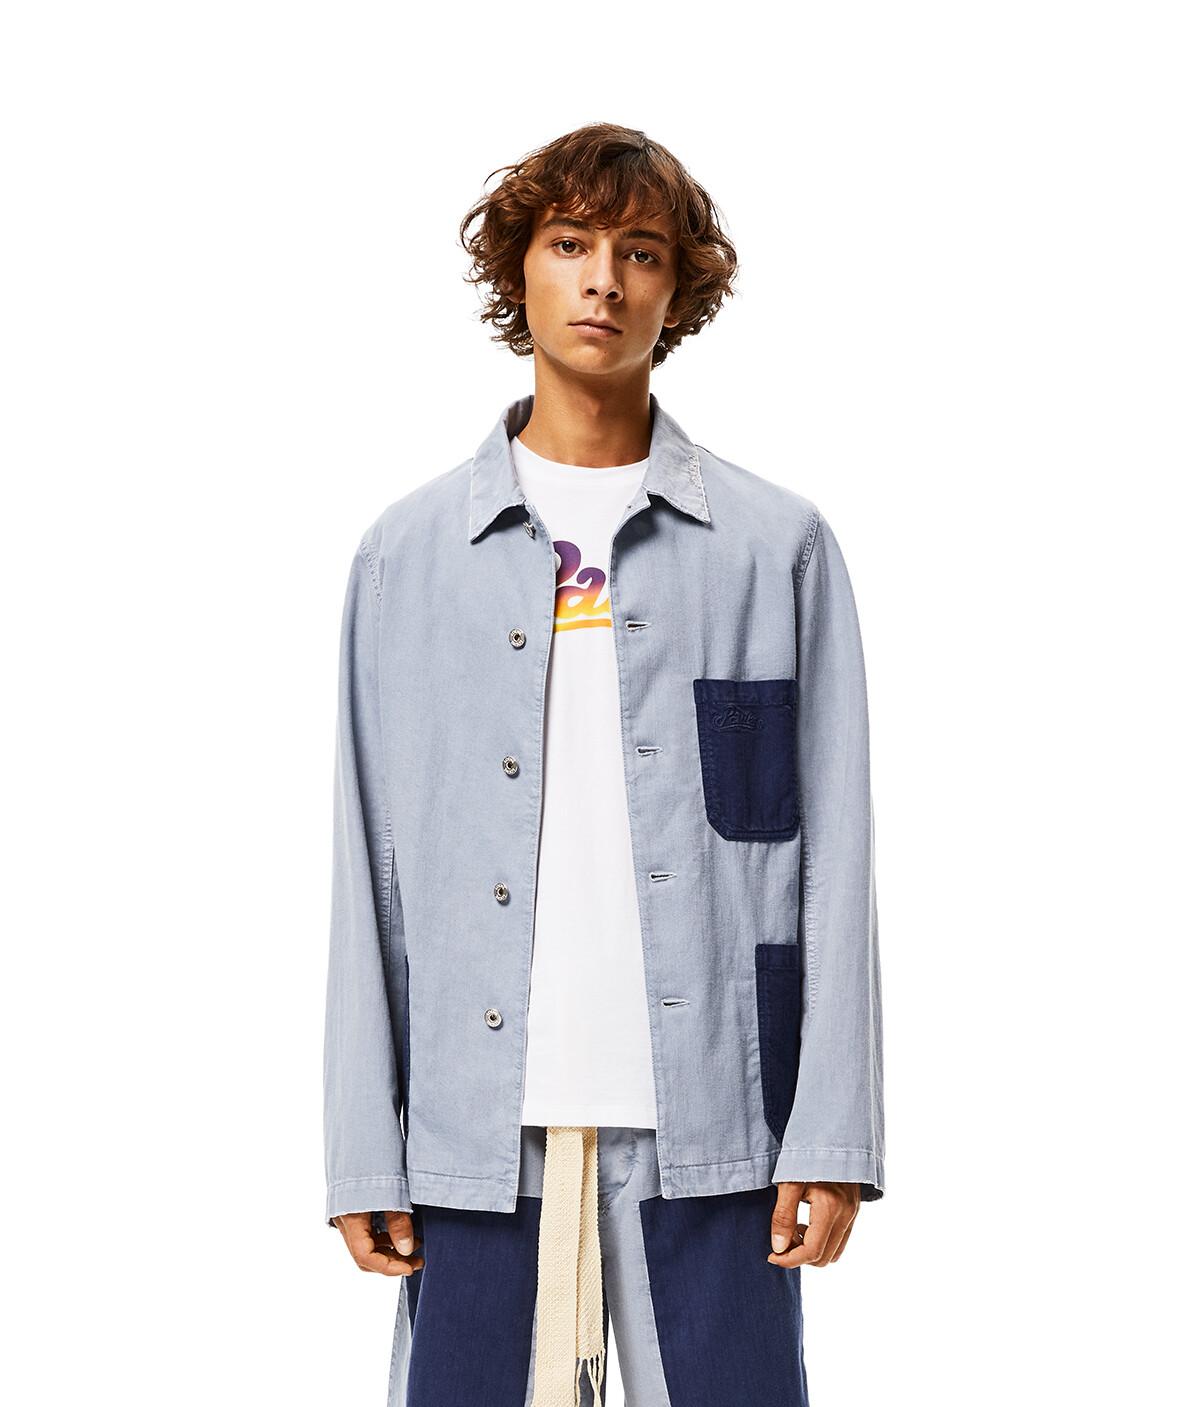 LOEWE Contrast Patch Workwear Jacket In Cotton Indigo/Light Blue front